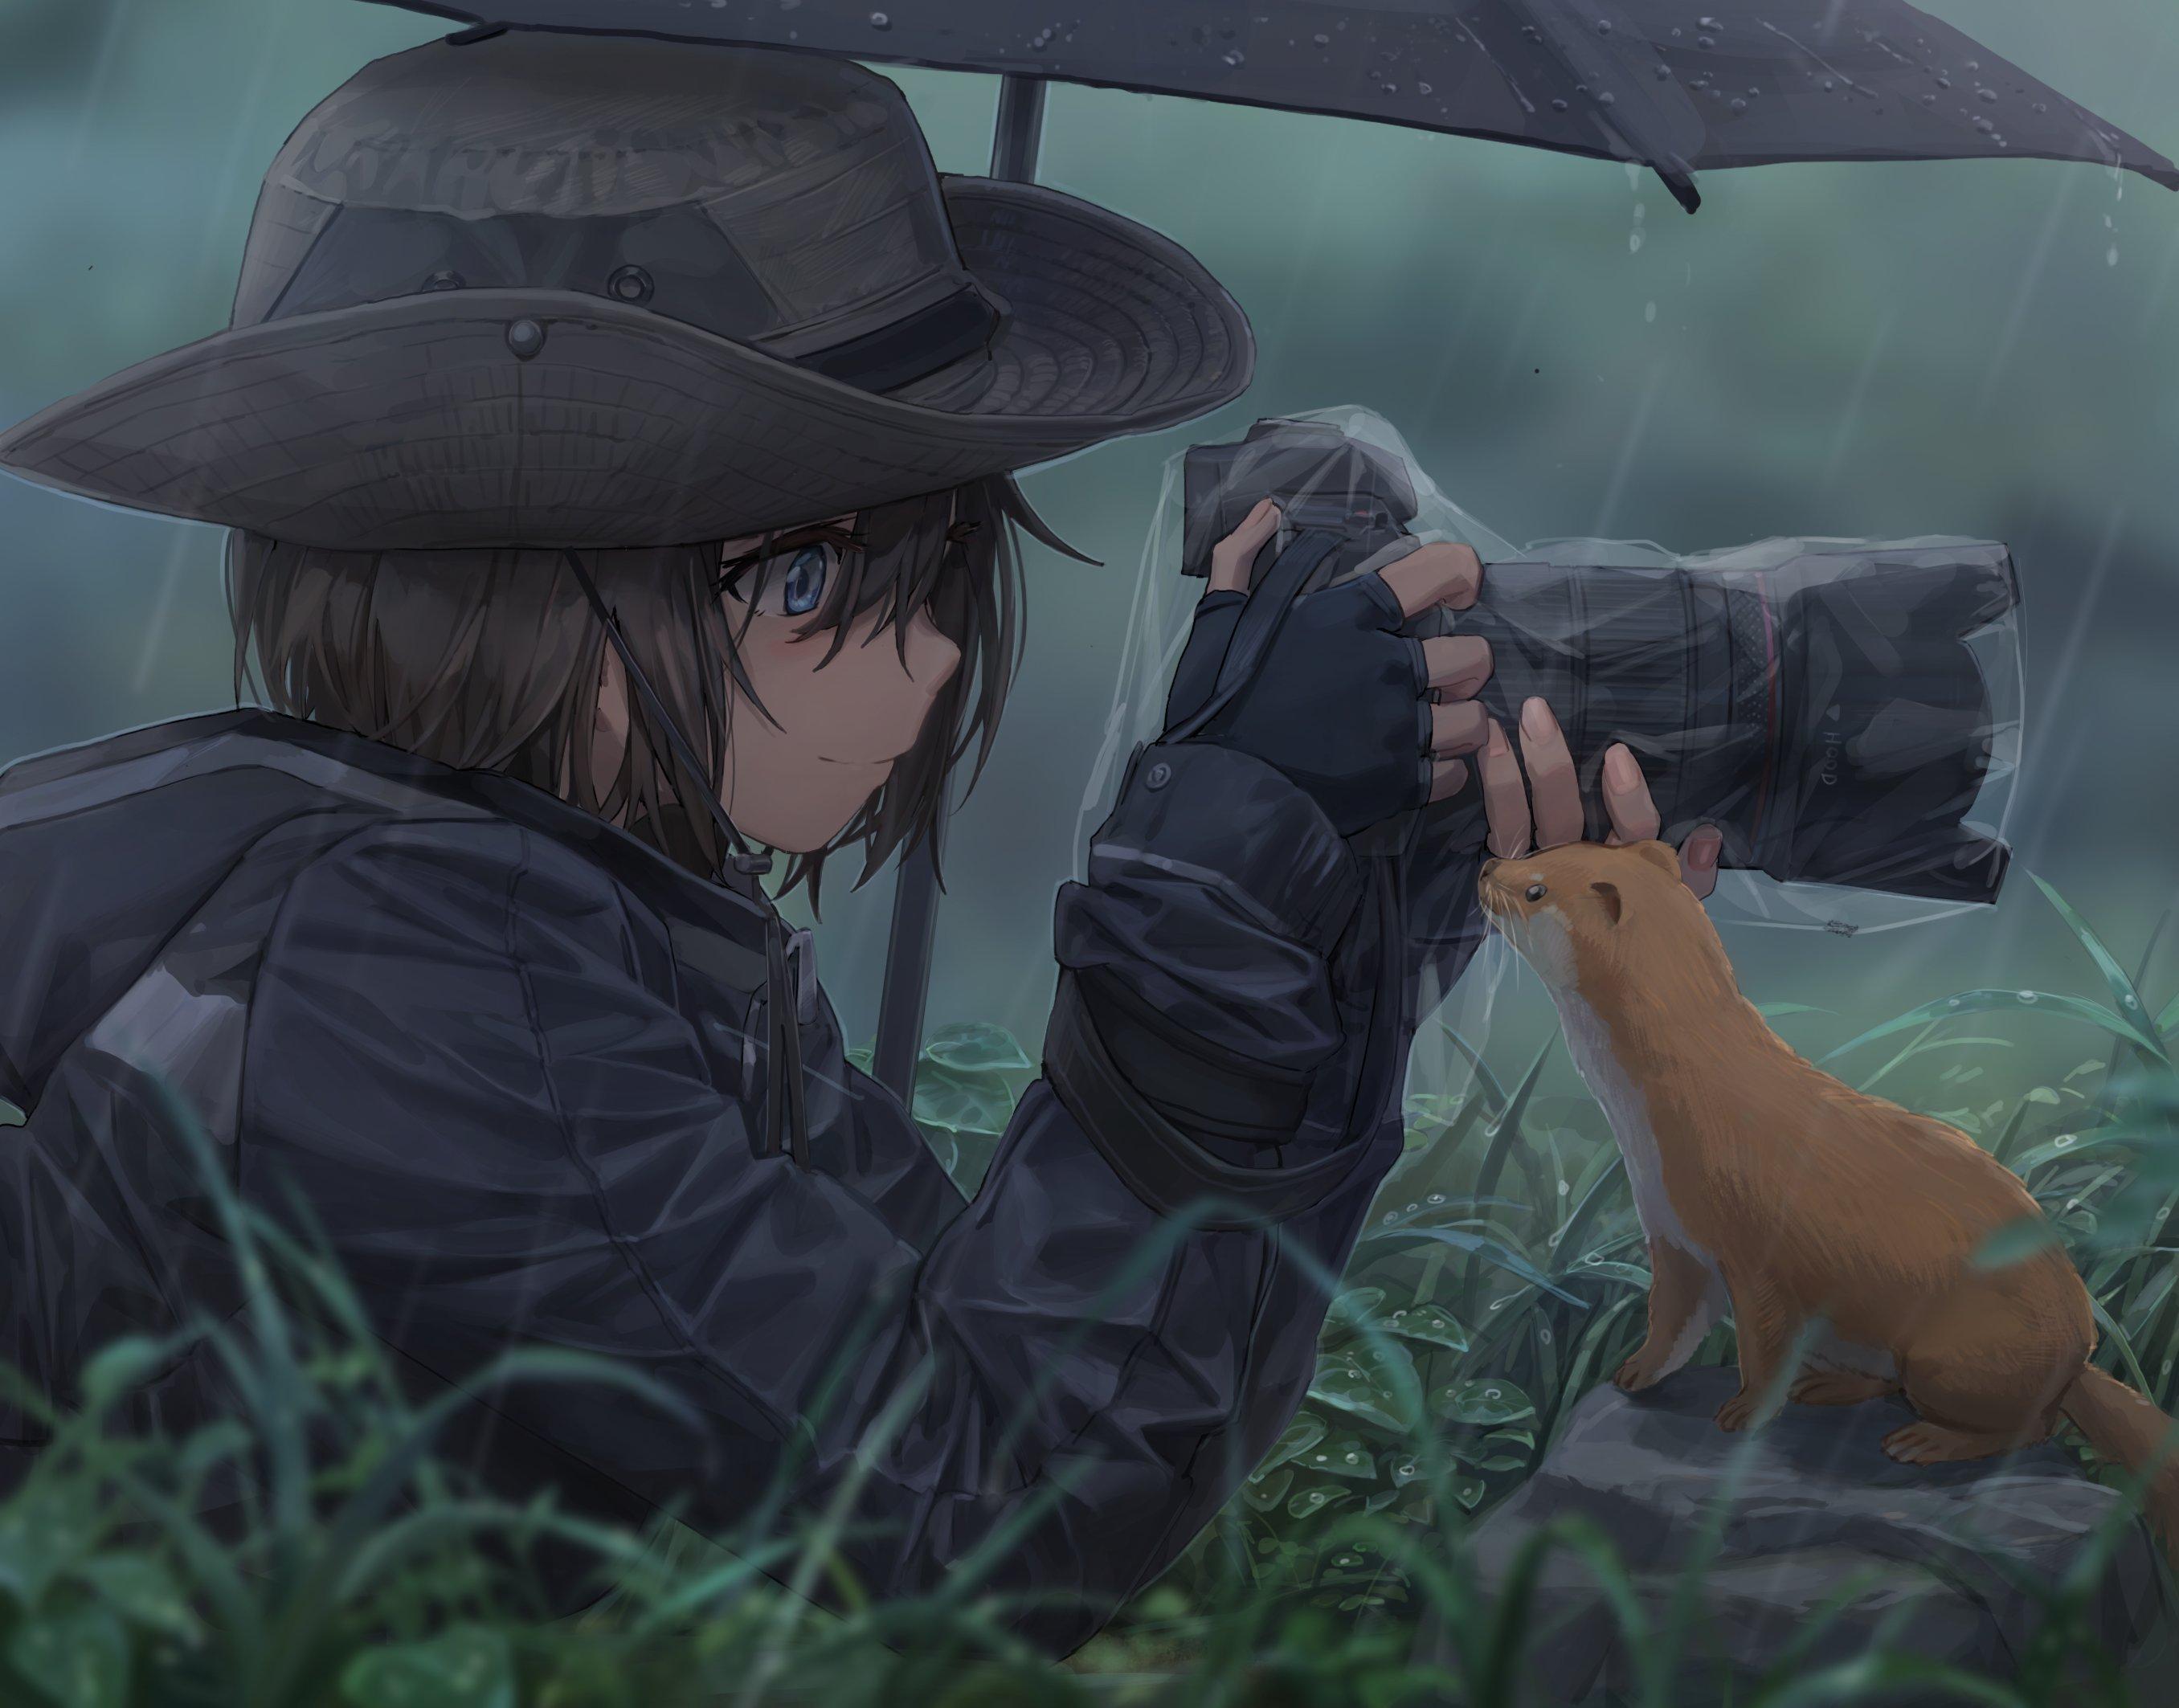 Anime 2712x2126 anime anime girls digital art artwork 2D portrait yohan1754 weasel rain umbrella camera hat smiling dark hair blue eyes short hair grass